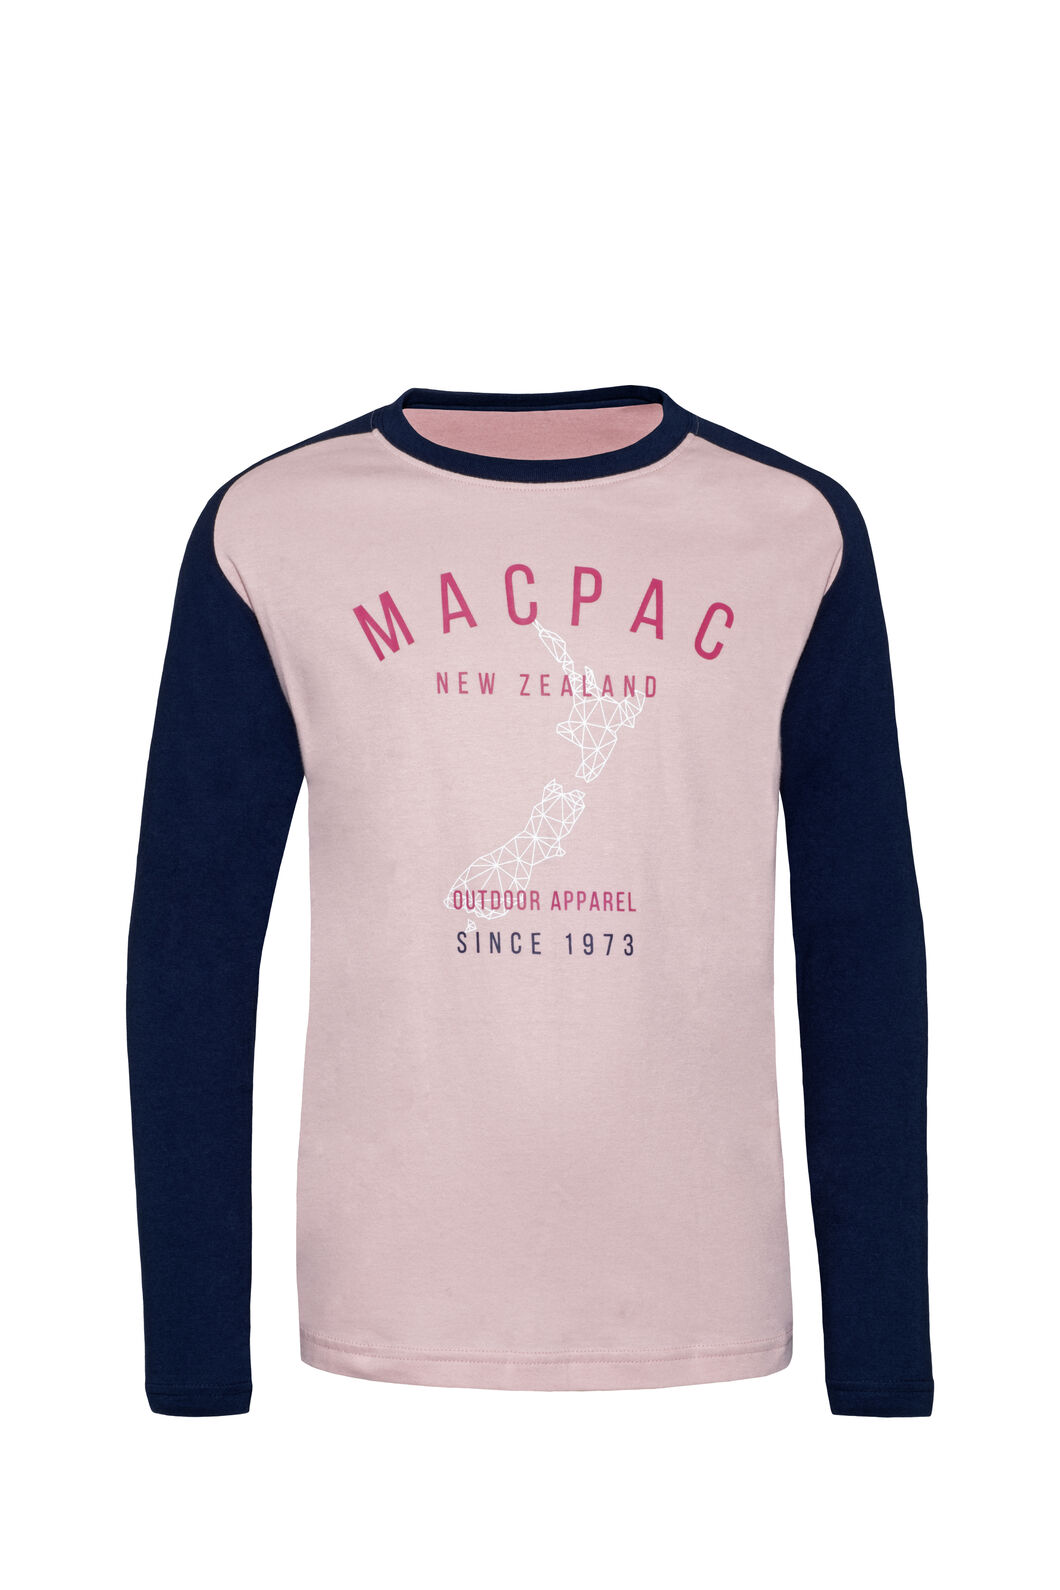 Macpac Outdoor Fairtrade Organic Cotton Long Sleeve Tee — Kids', Silver Pink, hi-res